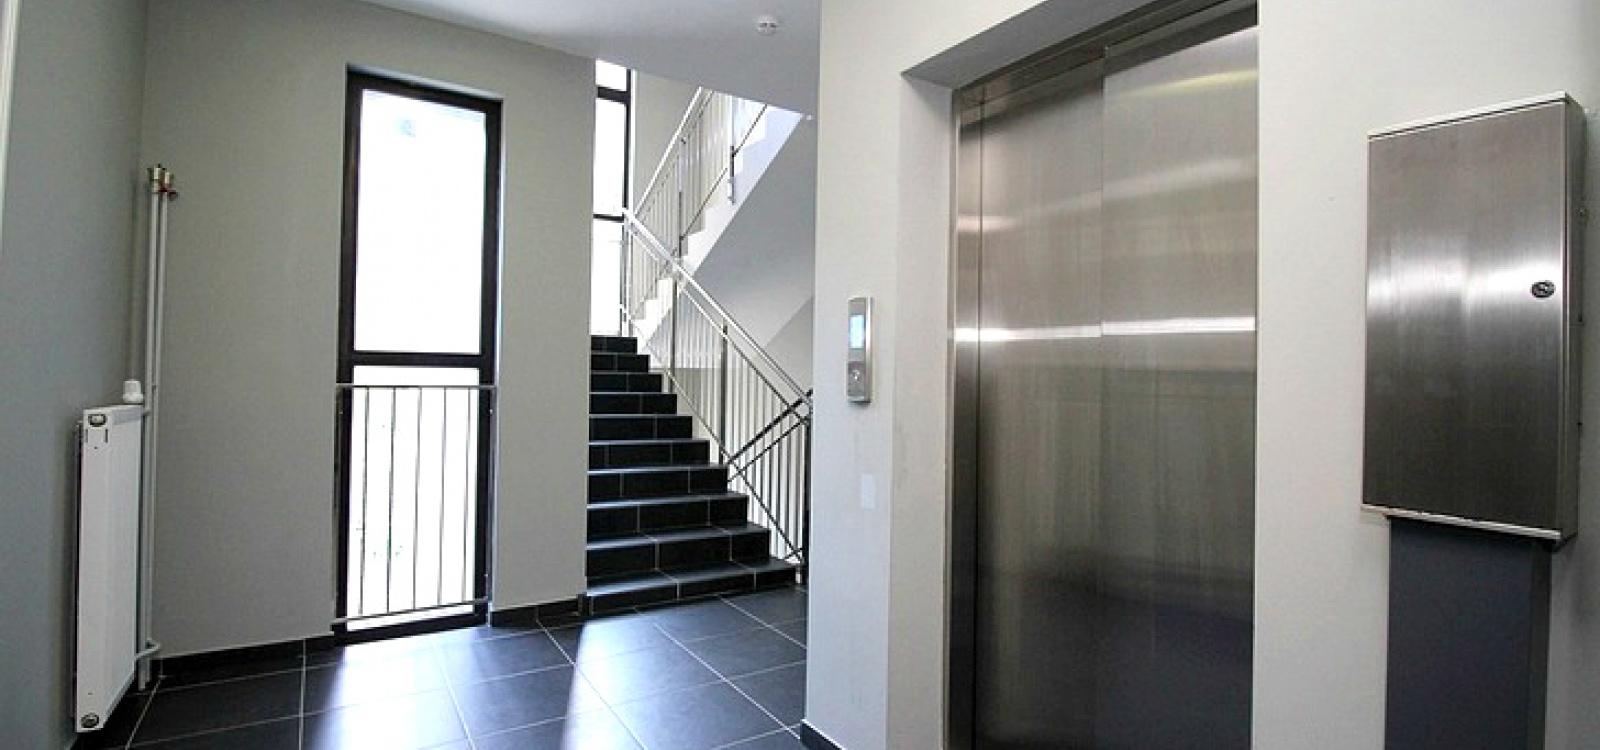 2 Bedrooms, Квартира, Продажа, 1 Bathrooms, Listing ID 1055, Красная Поляна, Краснодарский край, Россия,